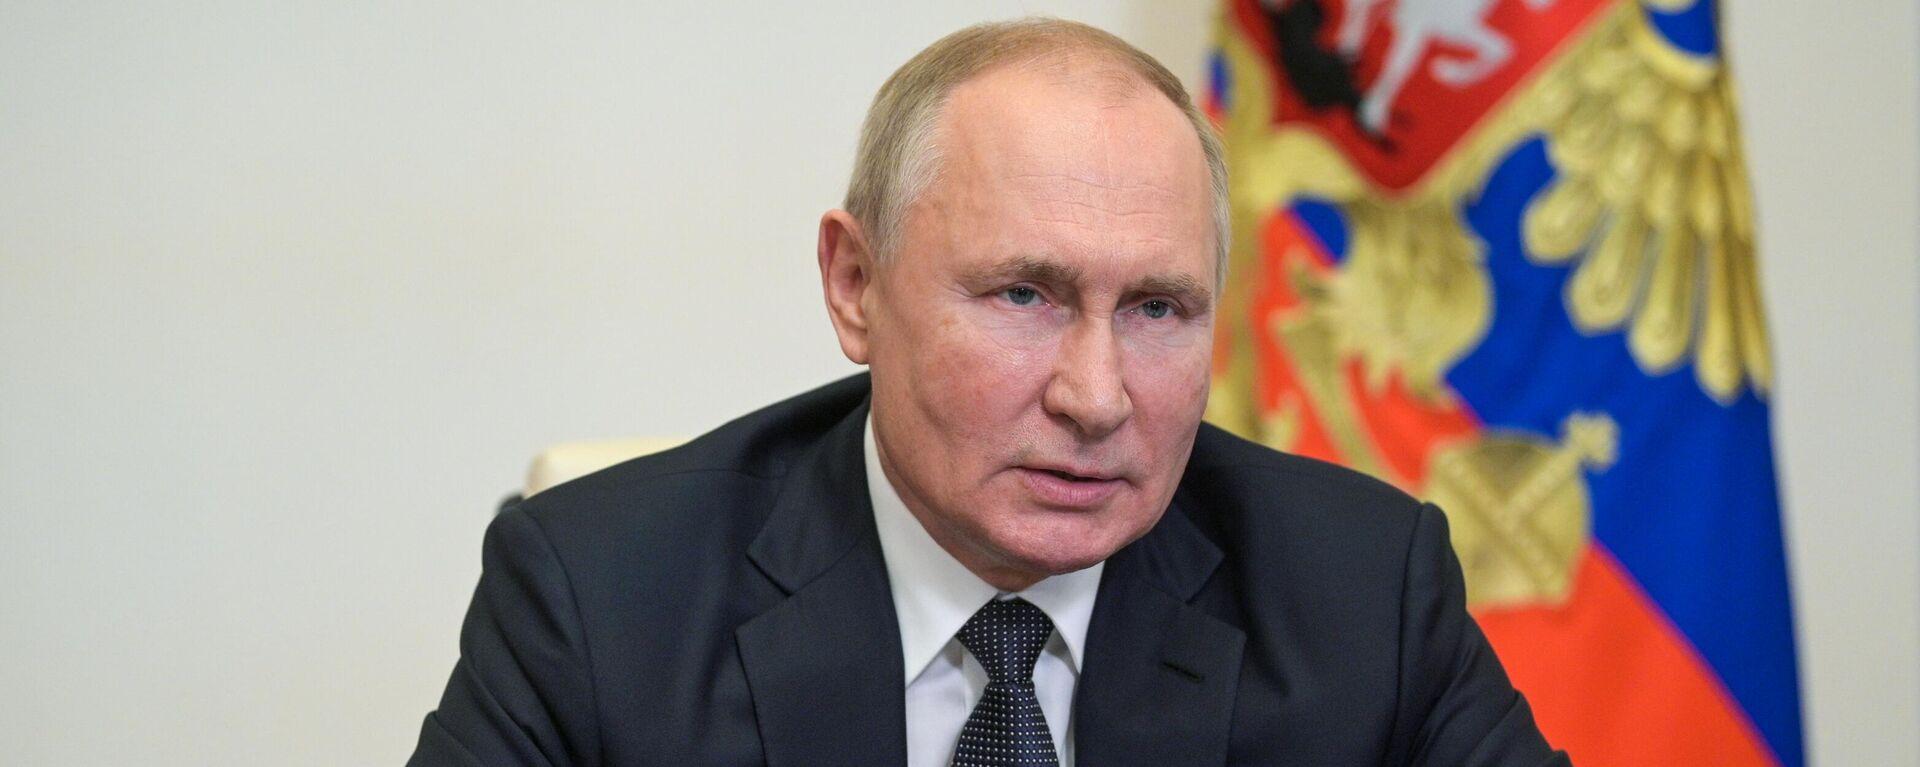 Ruski predsednik Vladimir Putin - Sputnik Srbija, 1920, 17.09.2021